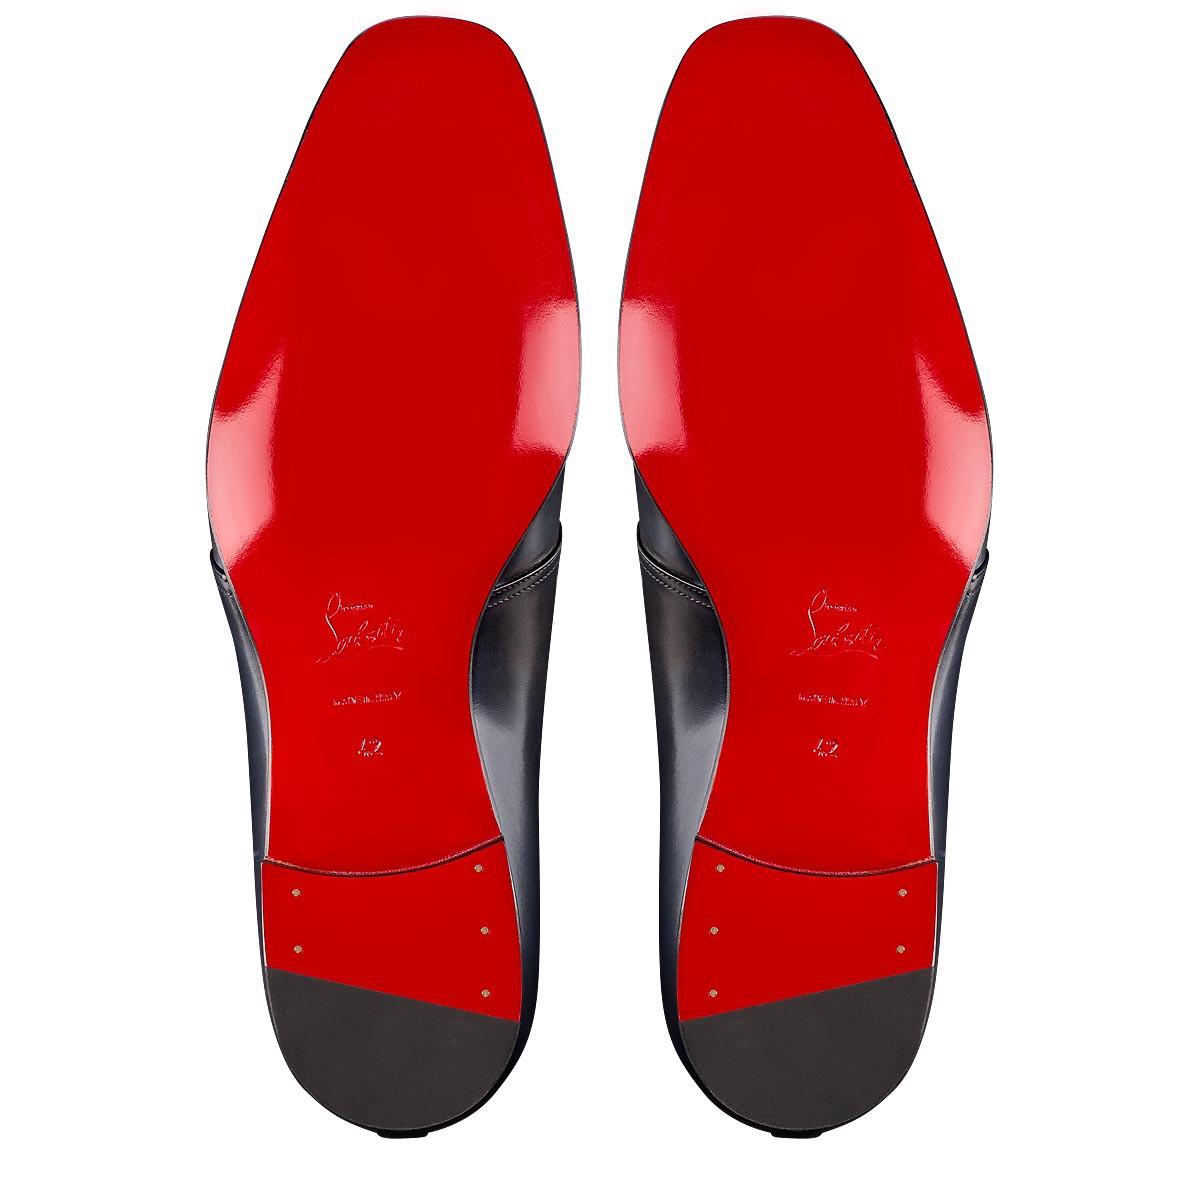 Shoes - Mortimer Flat - Christian Louboutin